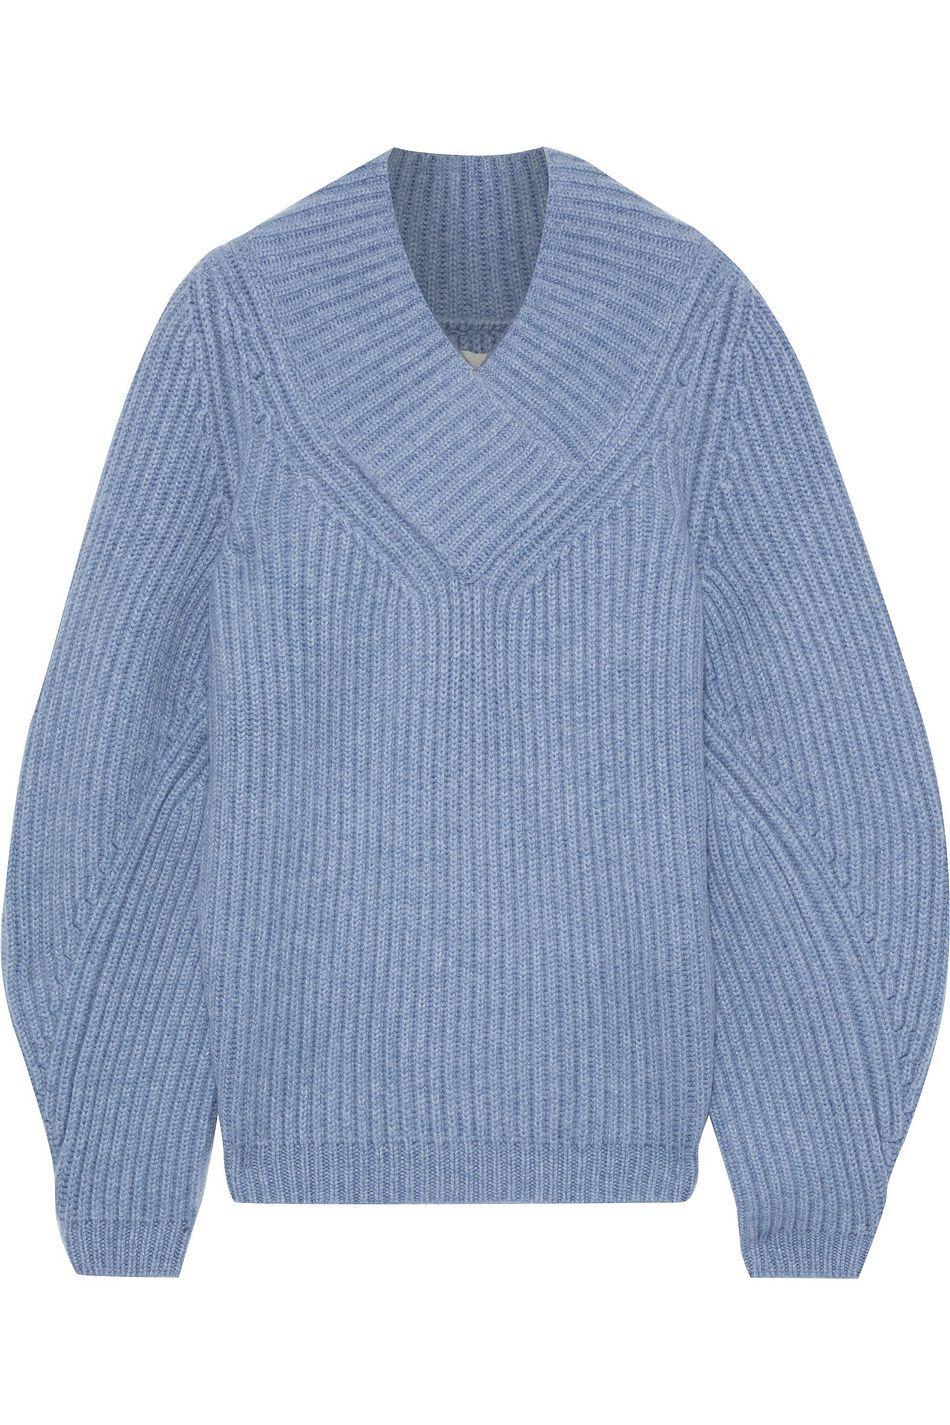 Carlito ribbed cashmere sweater in 2020 | Sweater sale